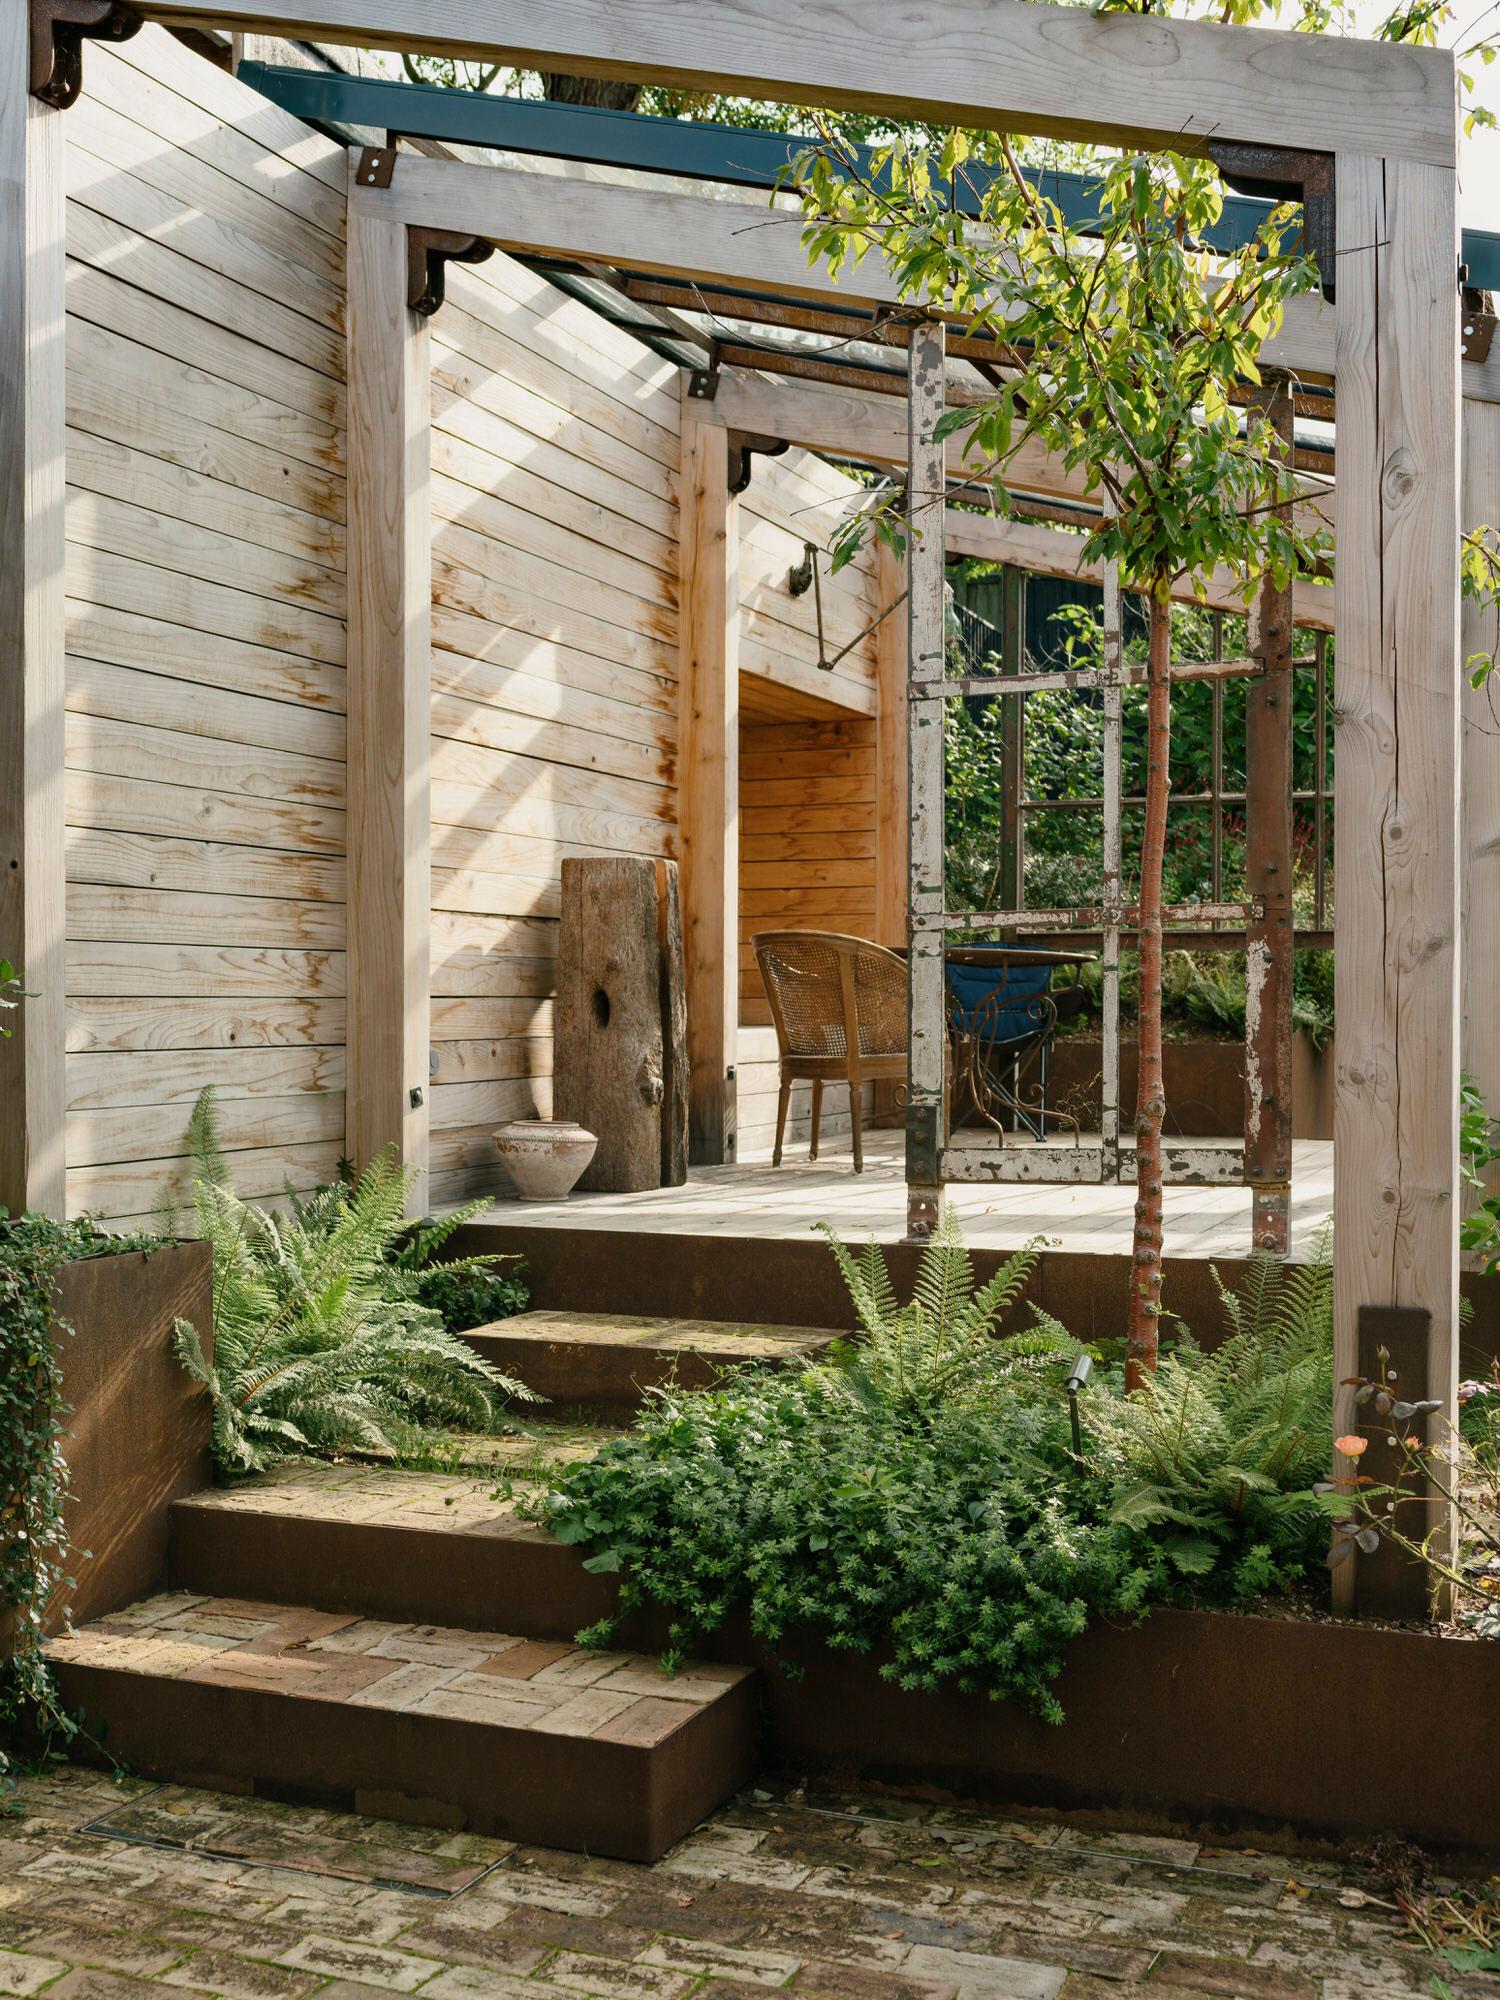 Sarah Wigglesworth, Haycroft Gardens Eco Friendly Multi Generational House London | Yellowtrace